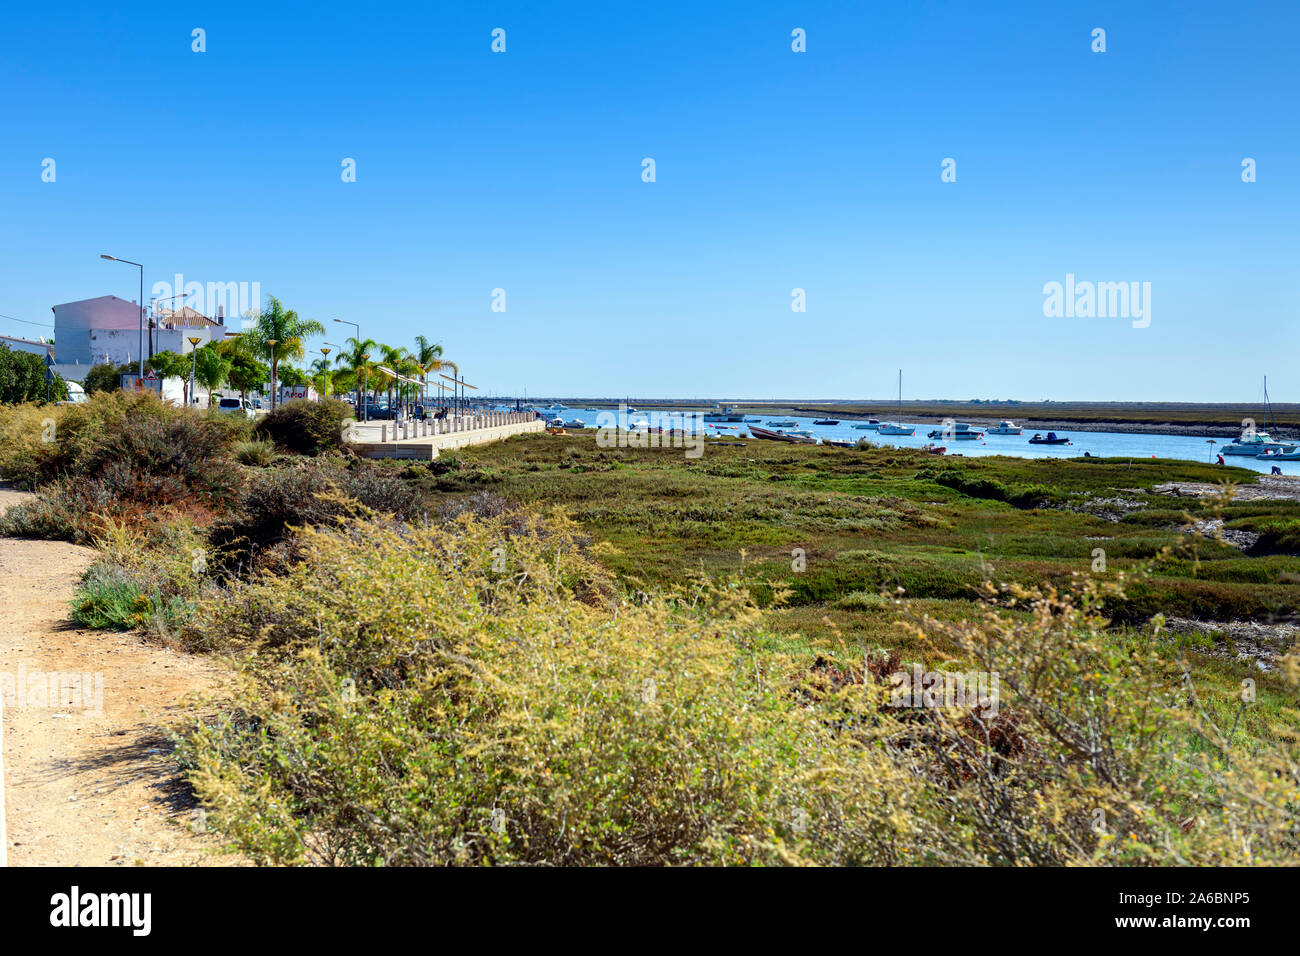 Ria formosa at Santa Luzia, Algarve, Portugal. Stock Photo